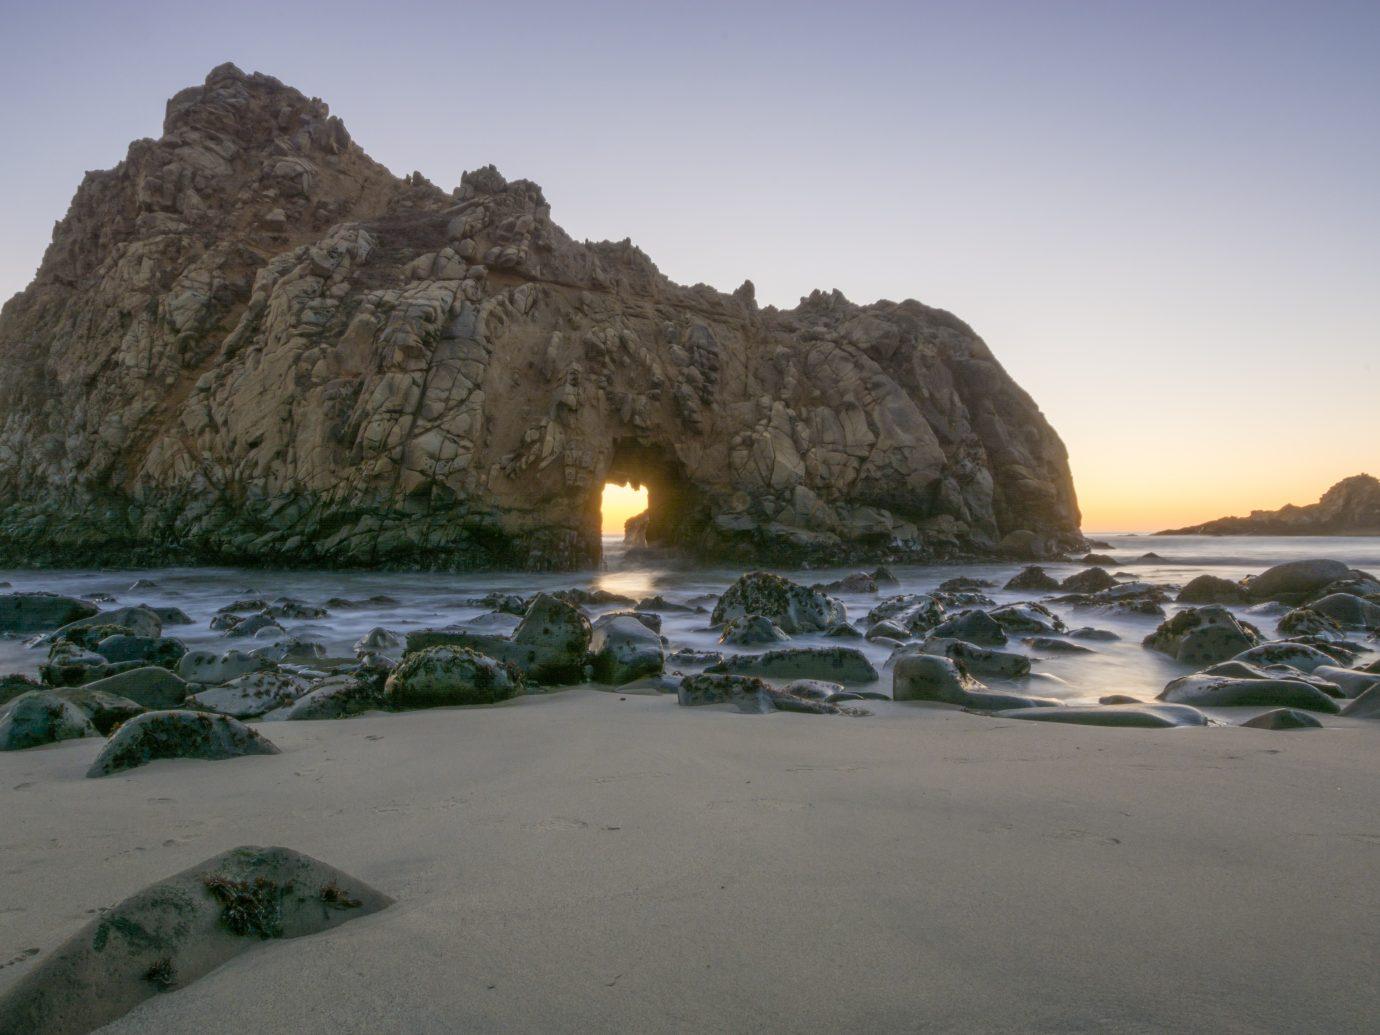 Setting sun glows through the keyhole at Pfeiffer Beach